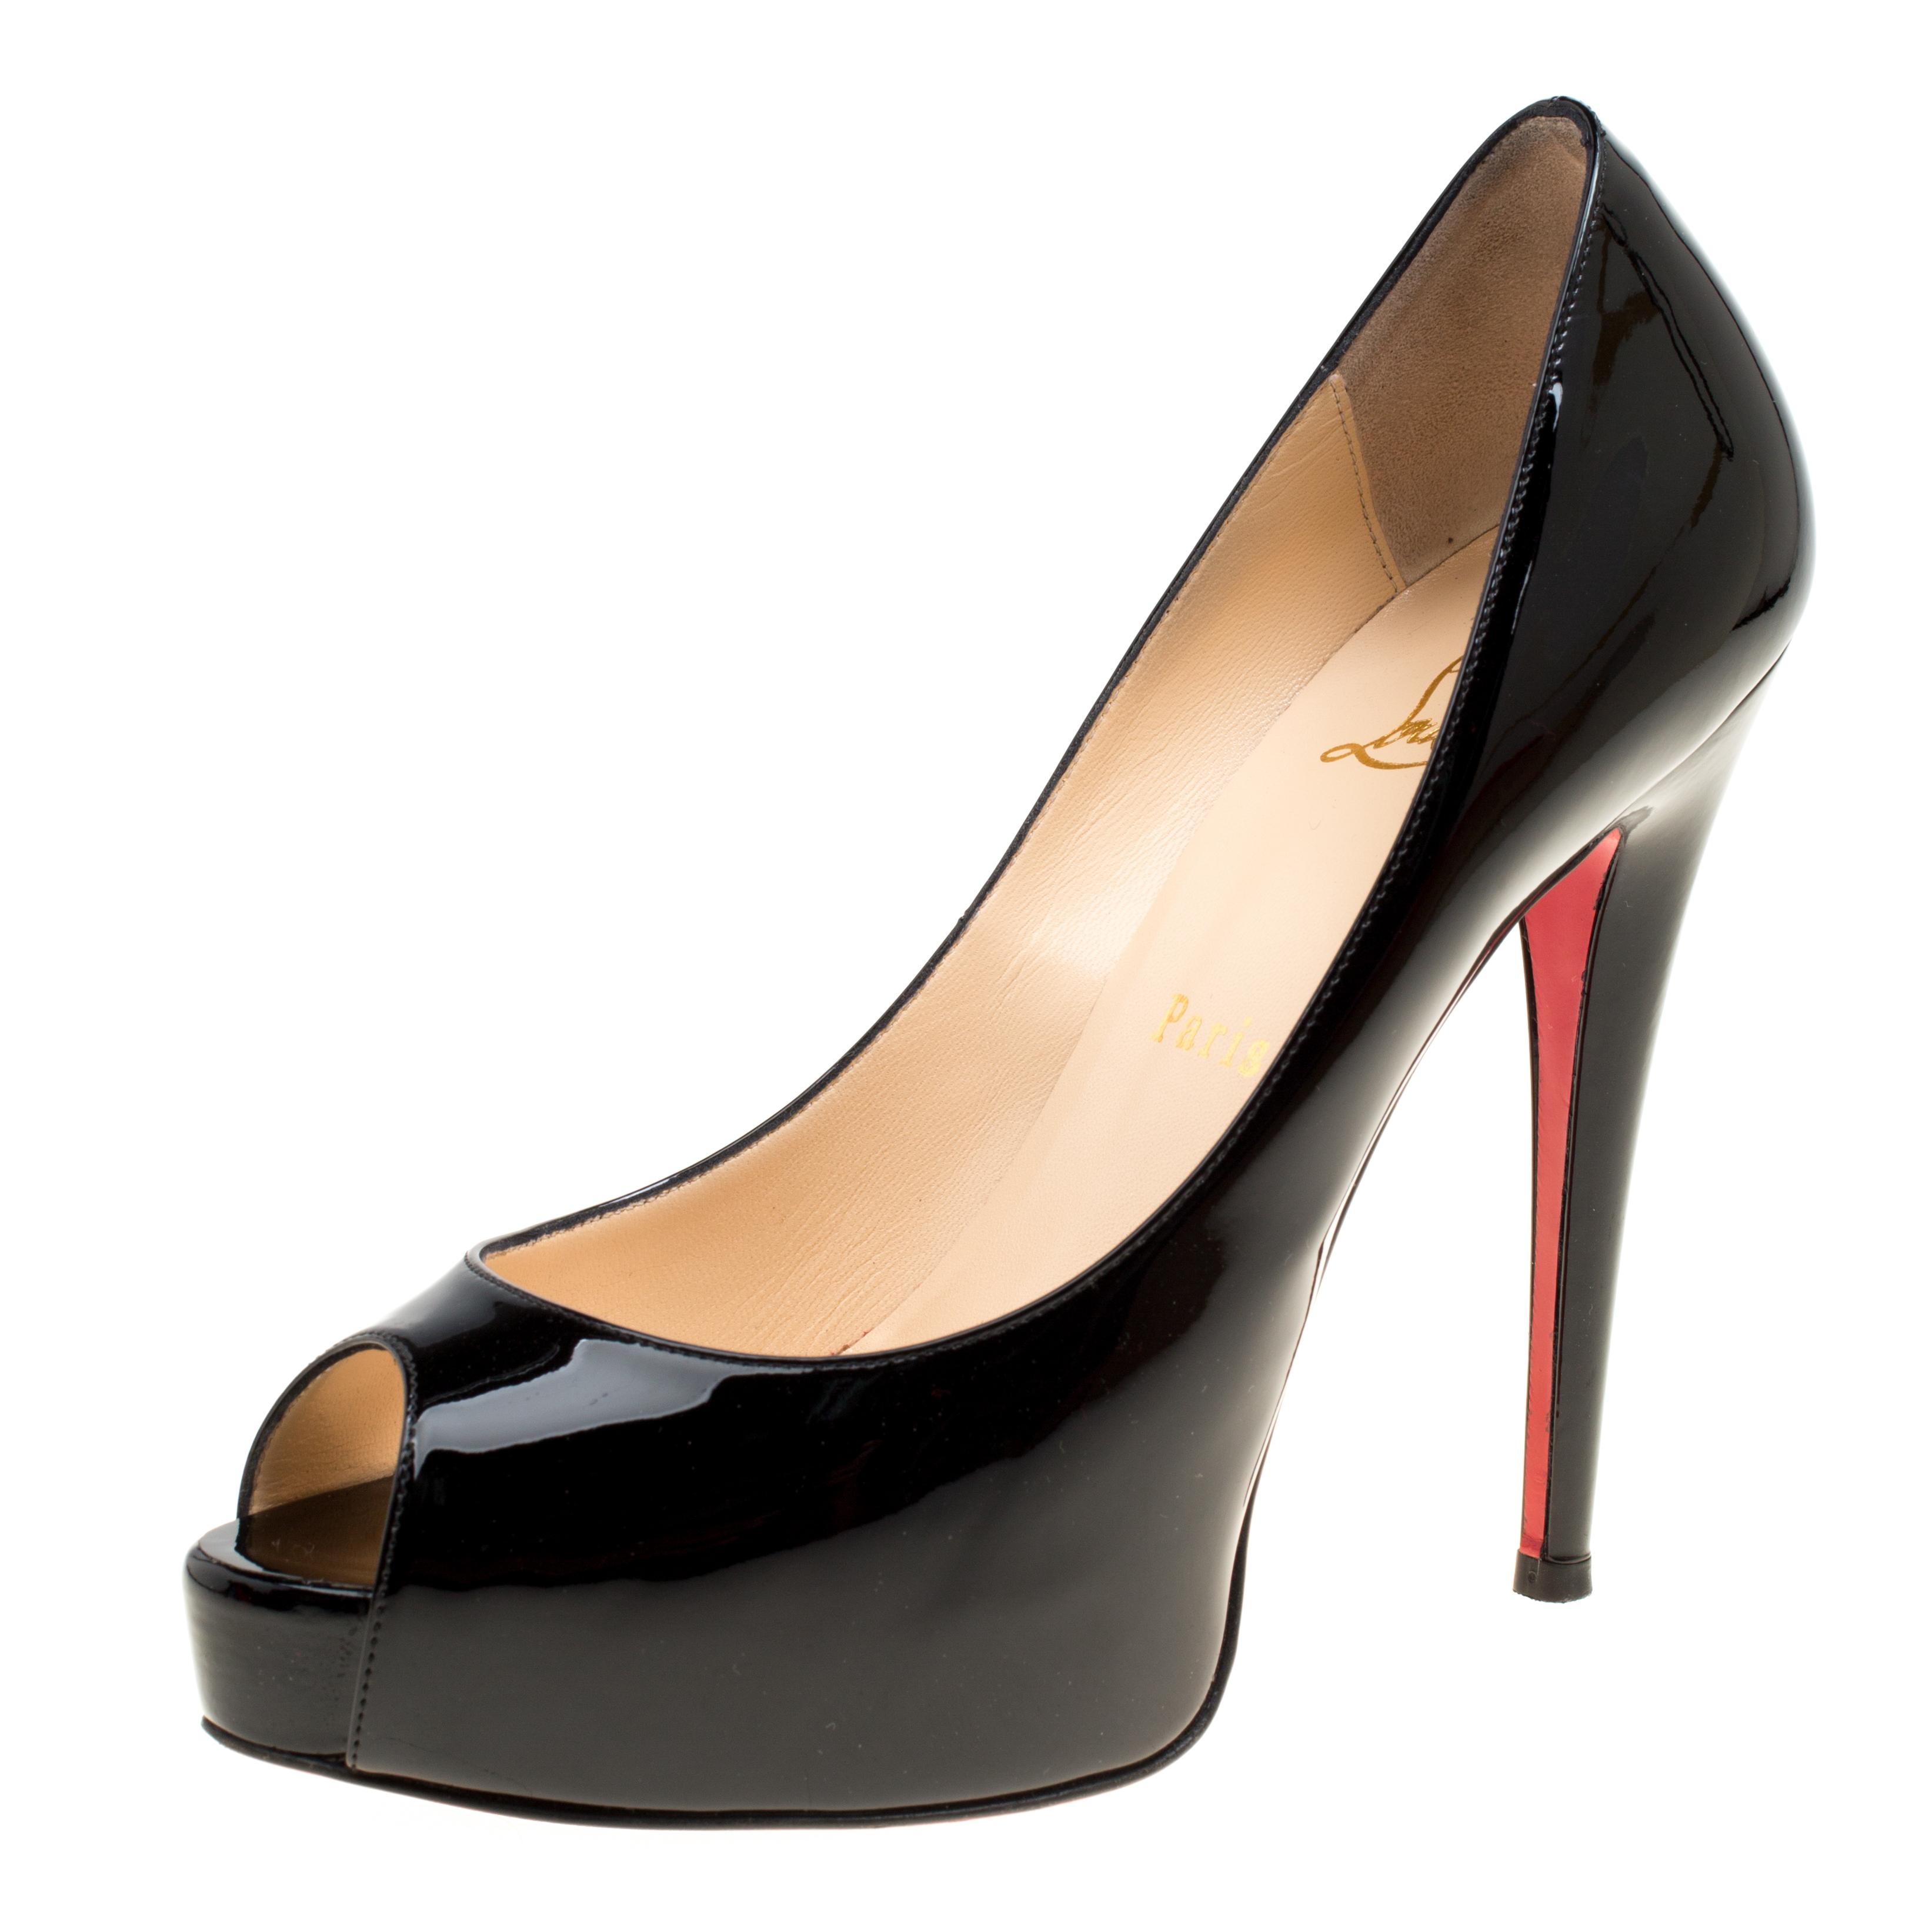 6816dc8c96c Christian Louboutin Black Patent Leather Hyper Prive Peep Toe Platform  Pumps Size 37